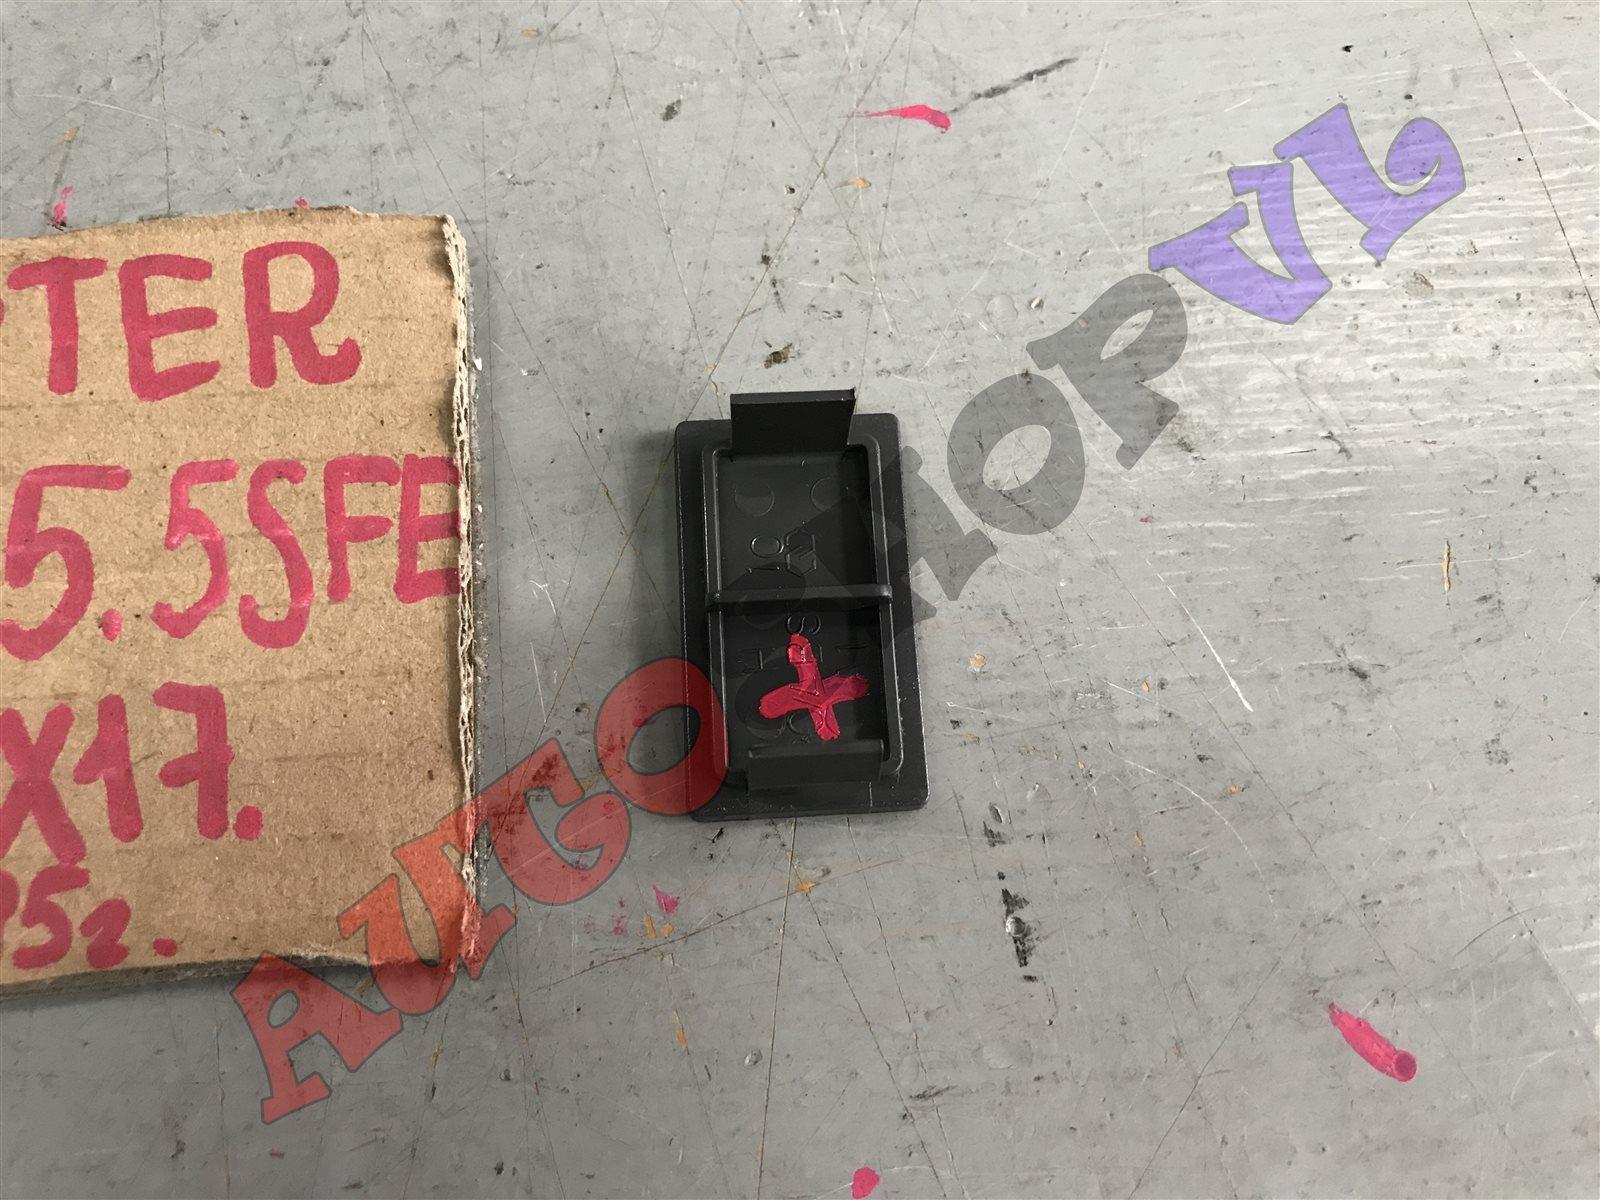 Заглушка SCEPTER 10.1995 SXV15 5SFE